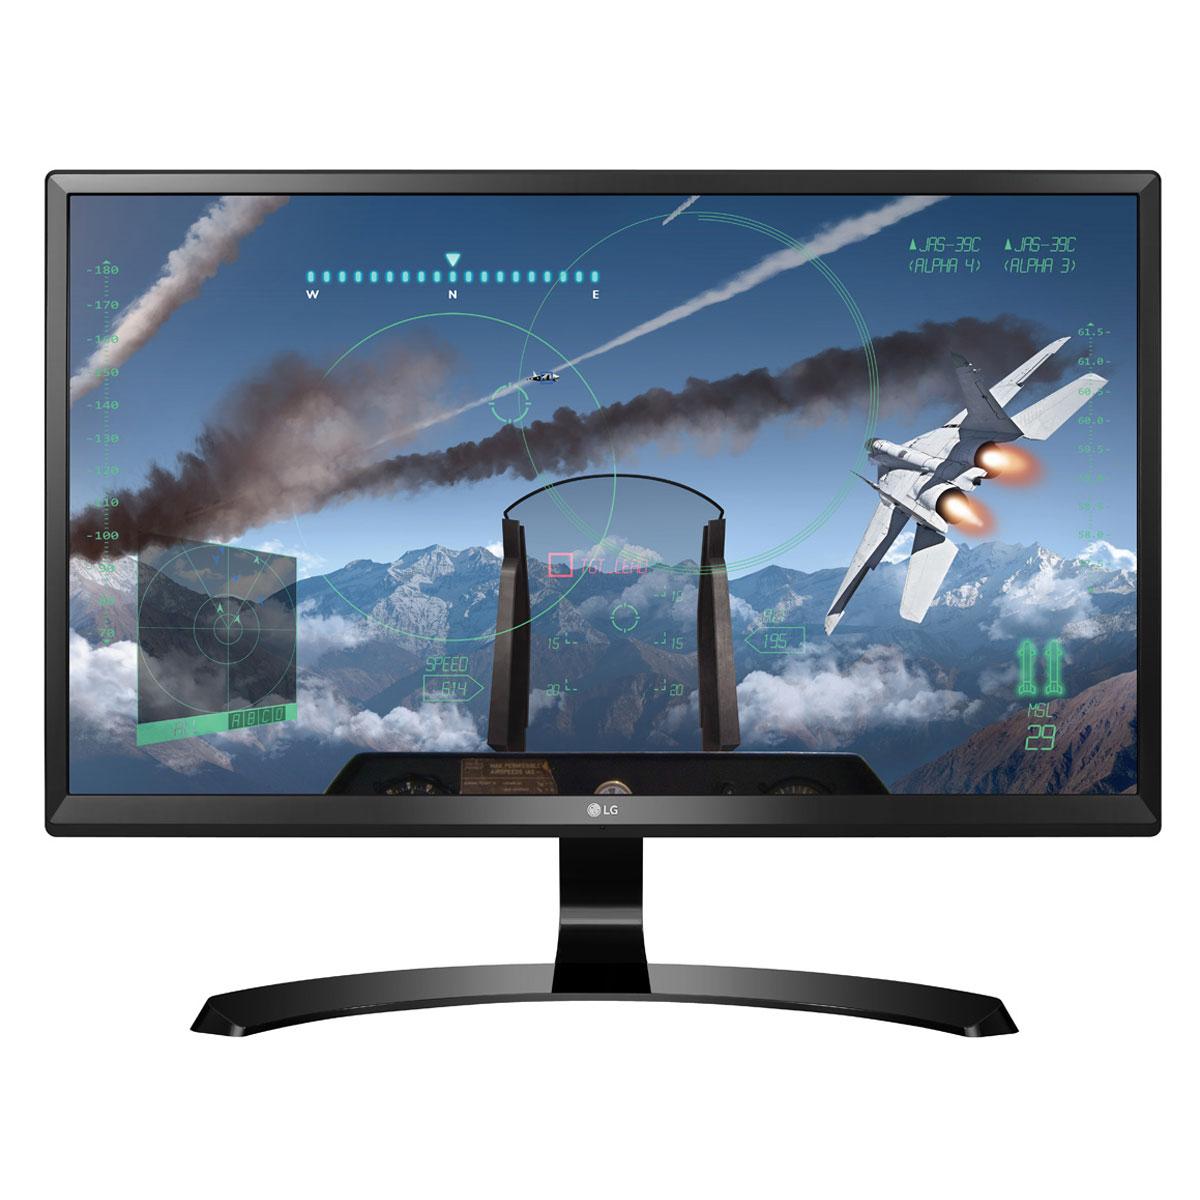 "Ecran PC 27"" LG 27UD58-B - IPS, 4K UHD, FreeSync, 5ms"